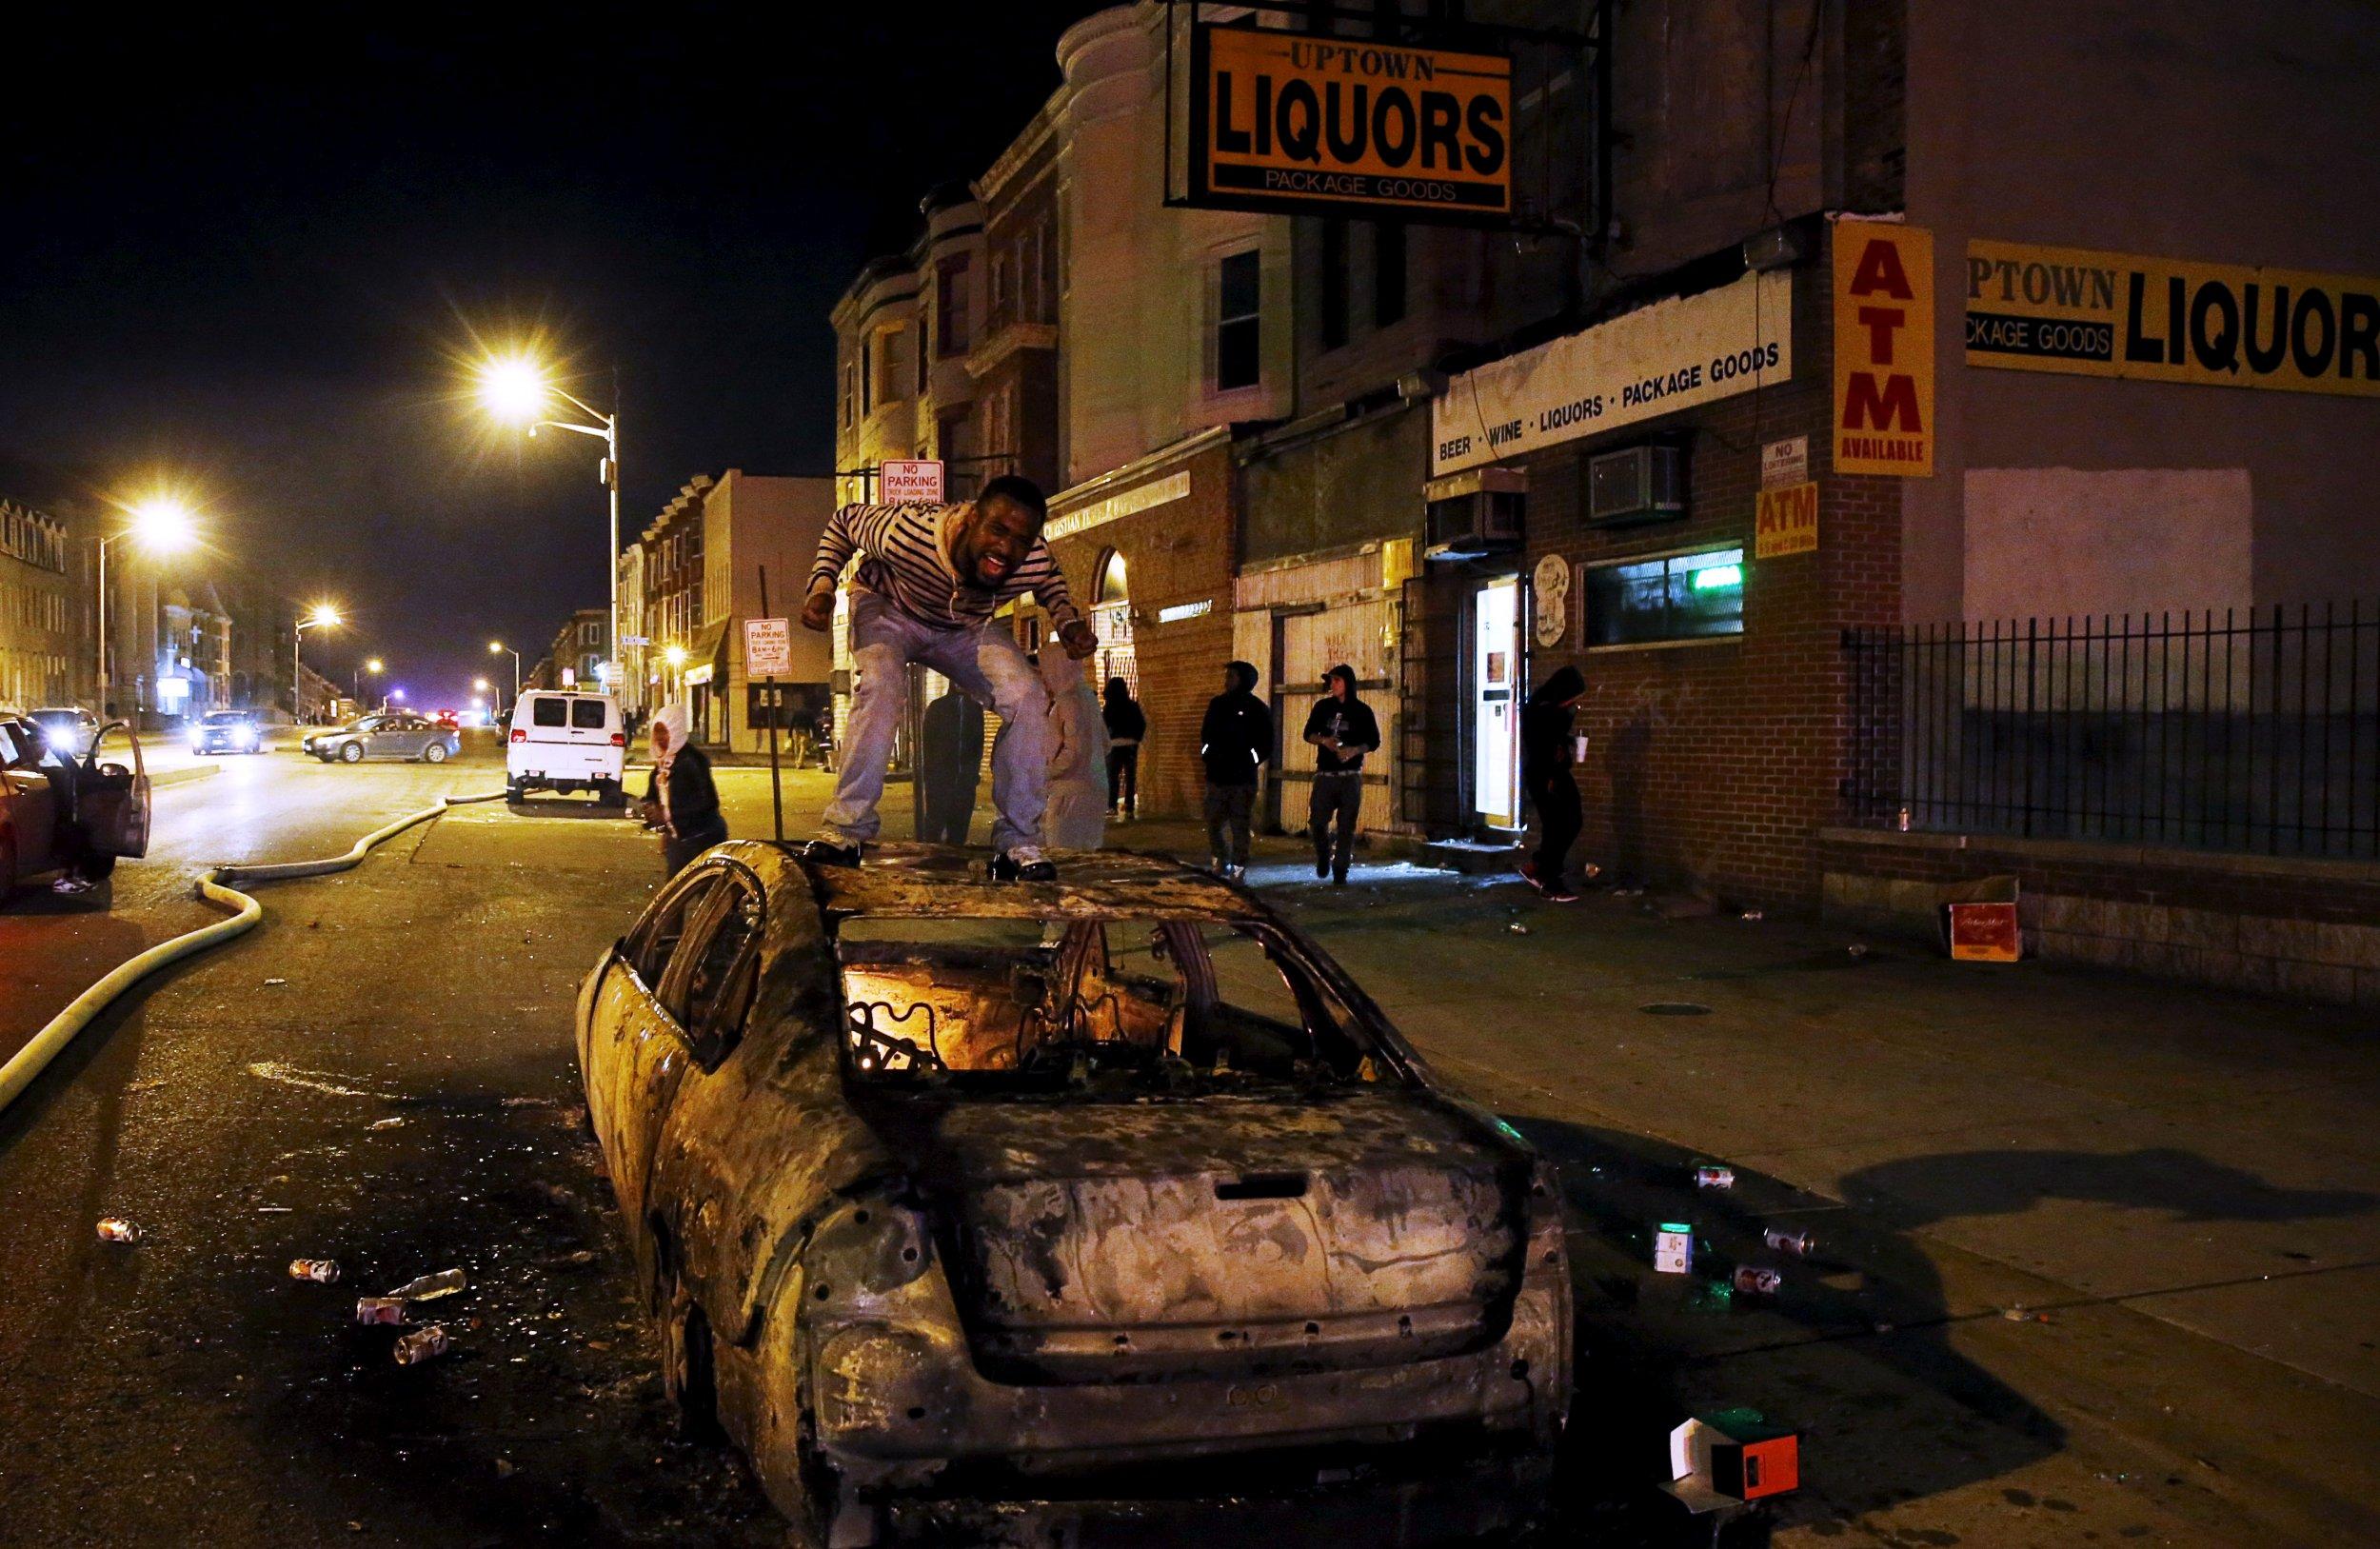 BaltimoreRiots